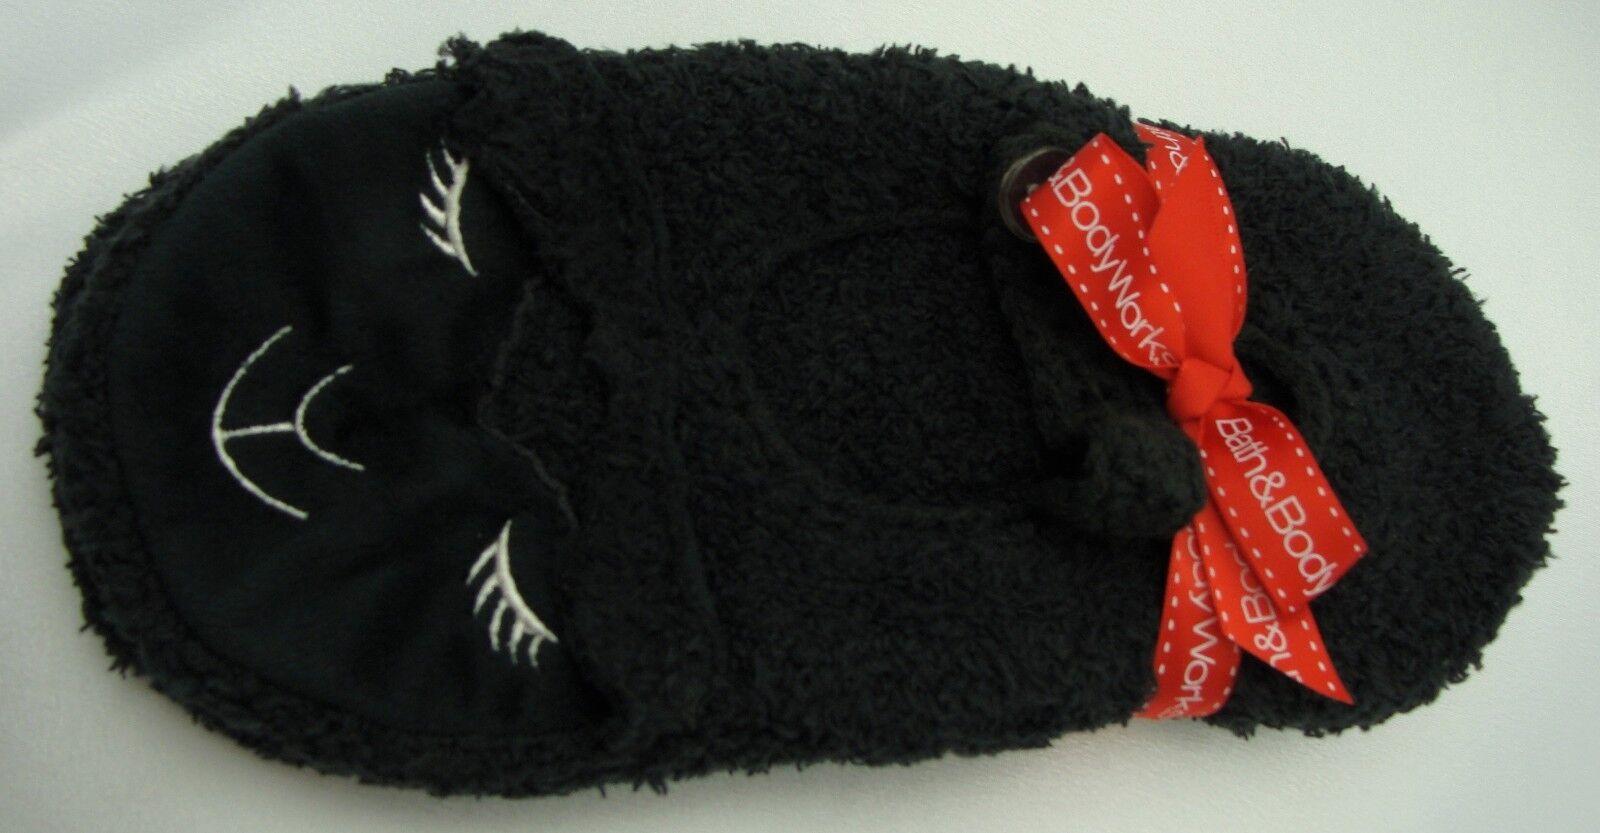 Bath Body Works Original BLACK LAMBIE Slippers Socks NEW Most One Größe Fits Most NEW 4ad40d